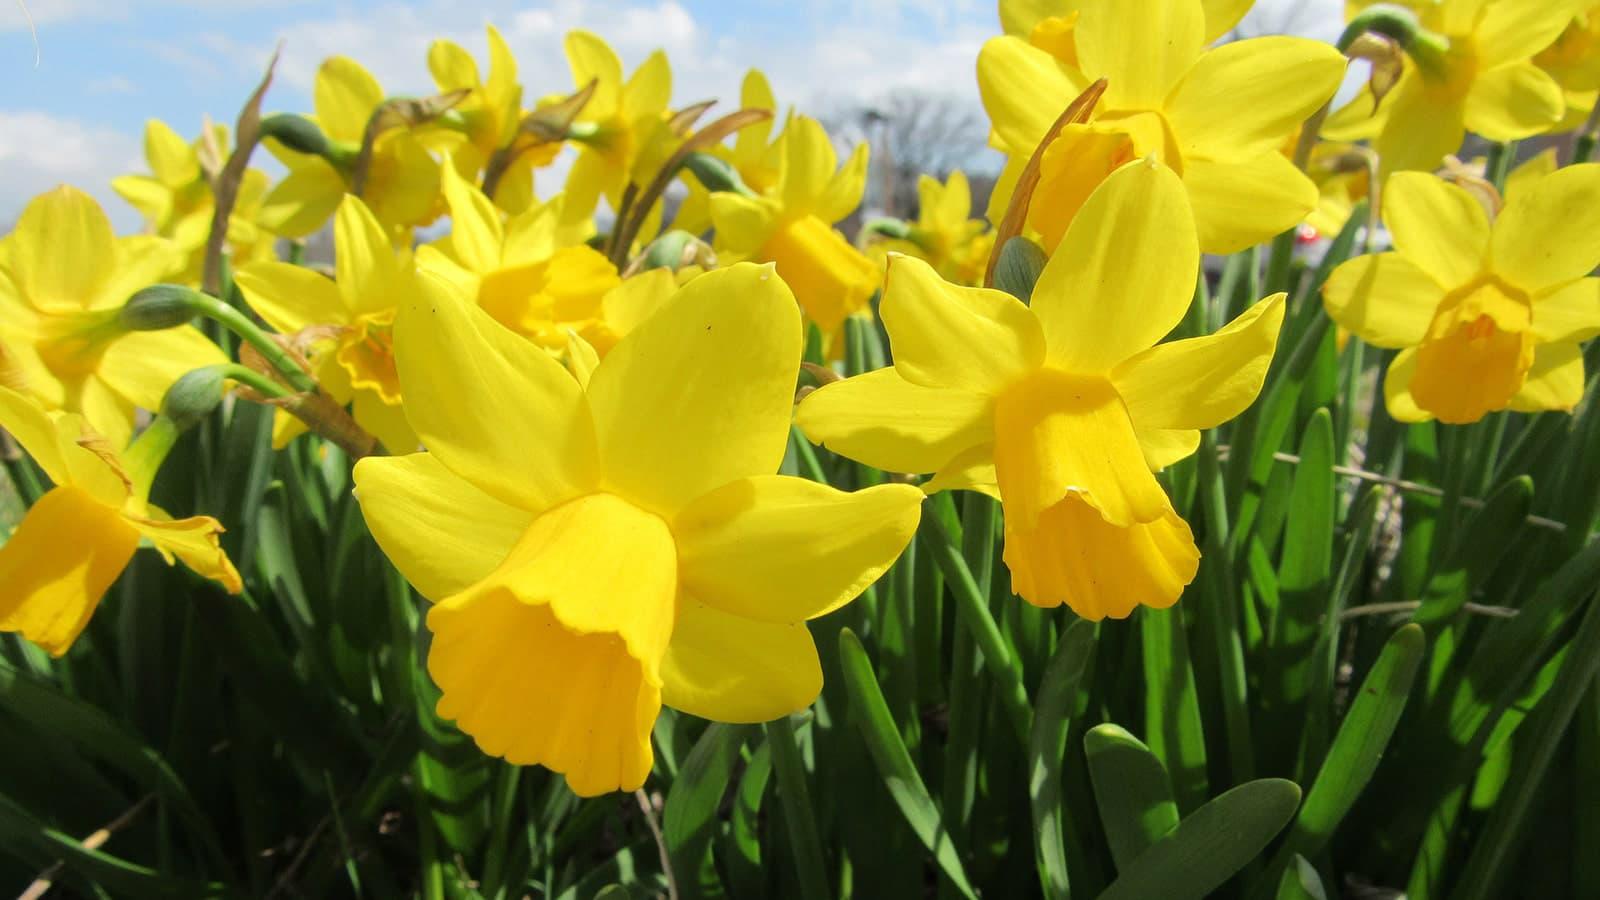 Close up image of daffodills